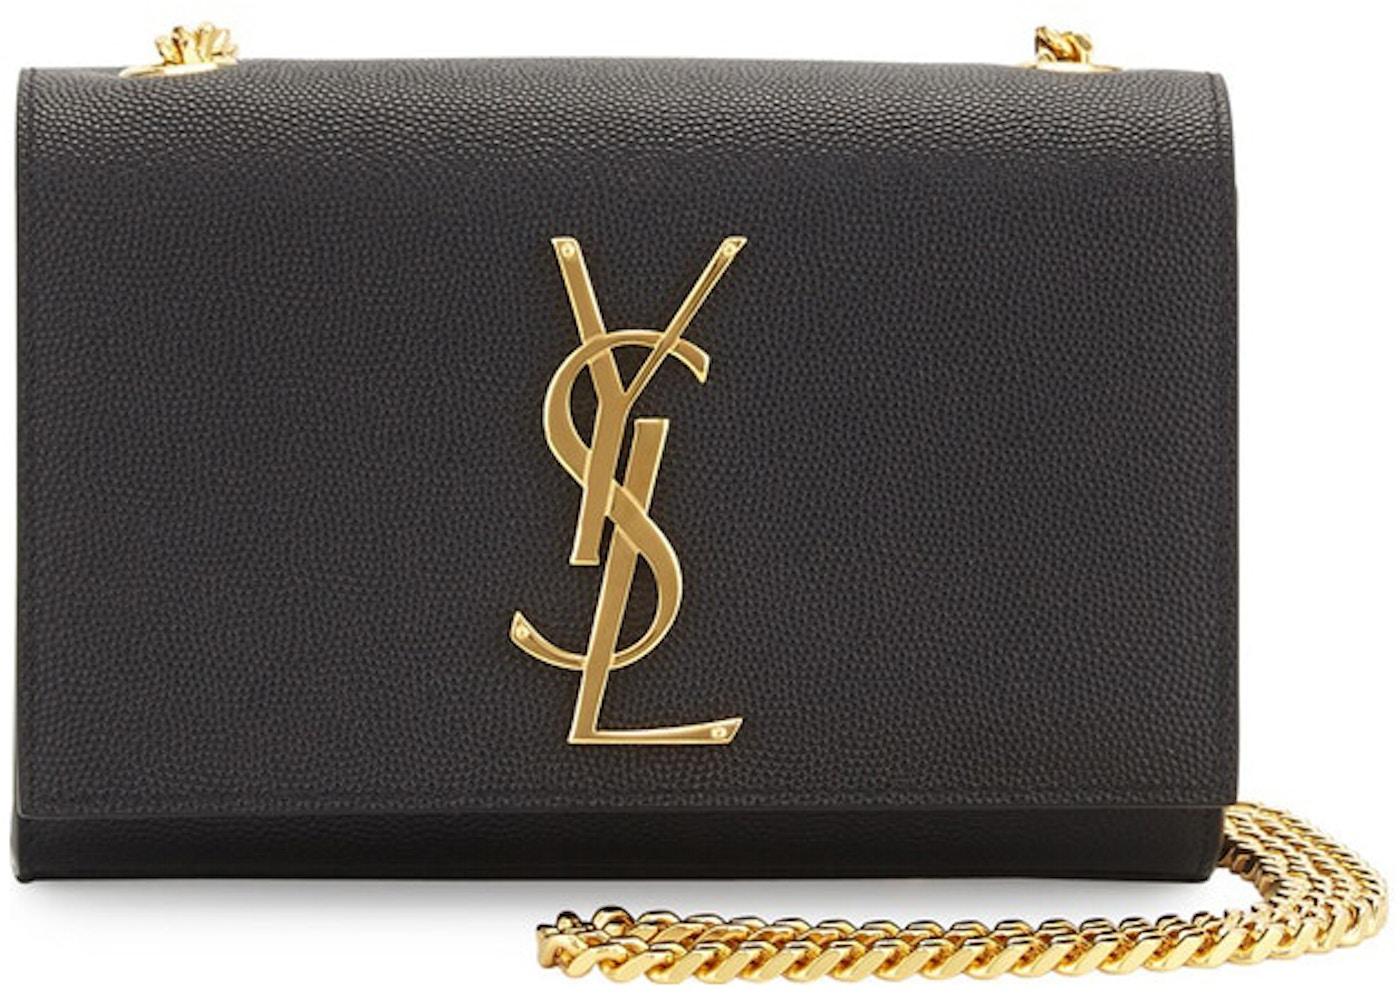 603ac36502 Saint Laurent Kate Crossbody YSL Pebbled Black